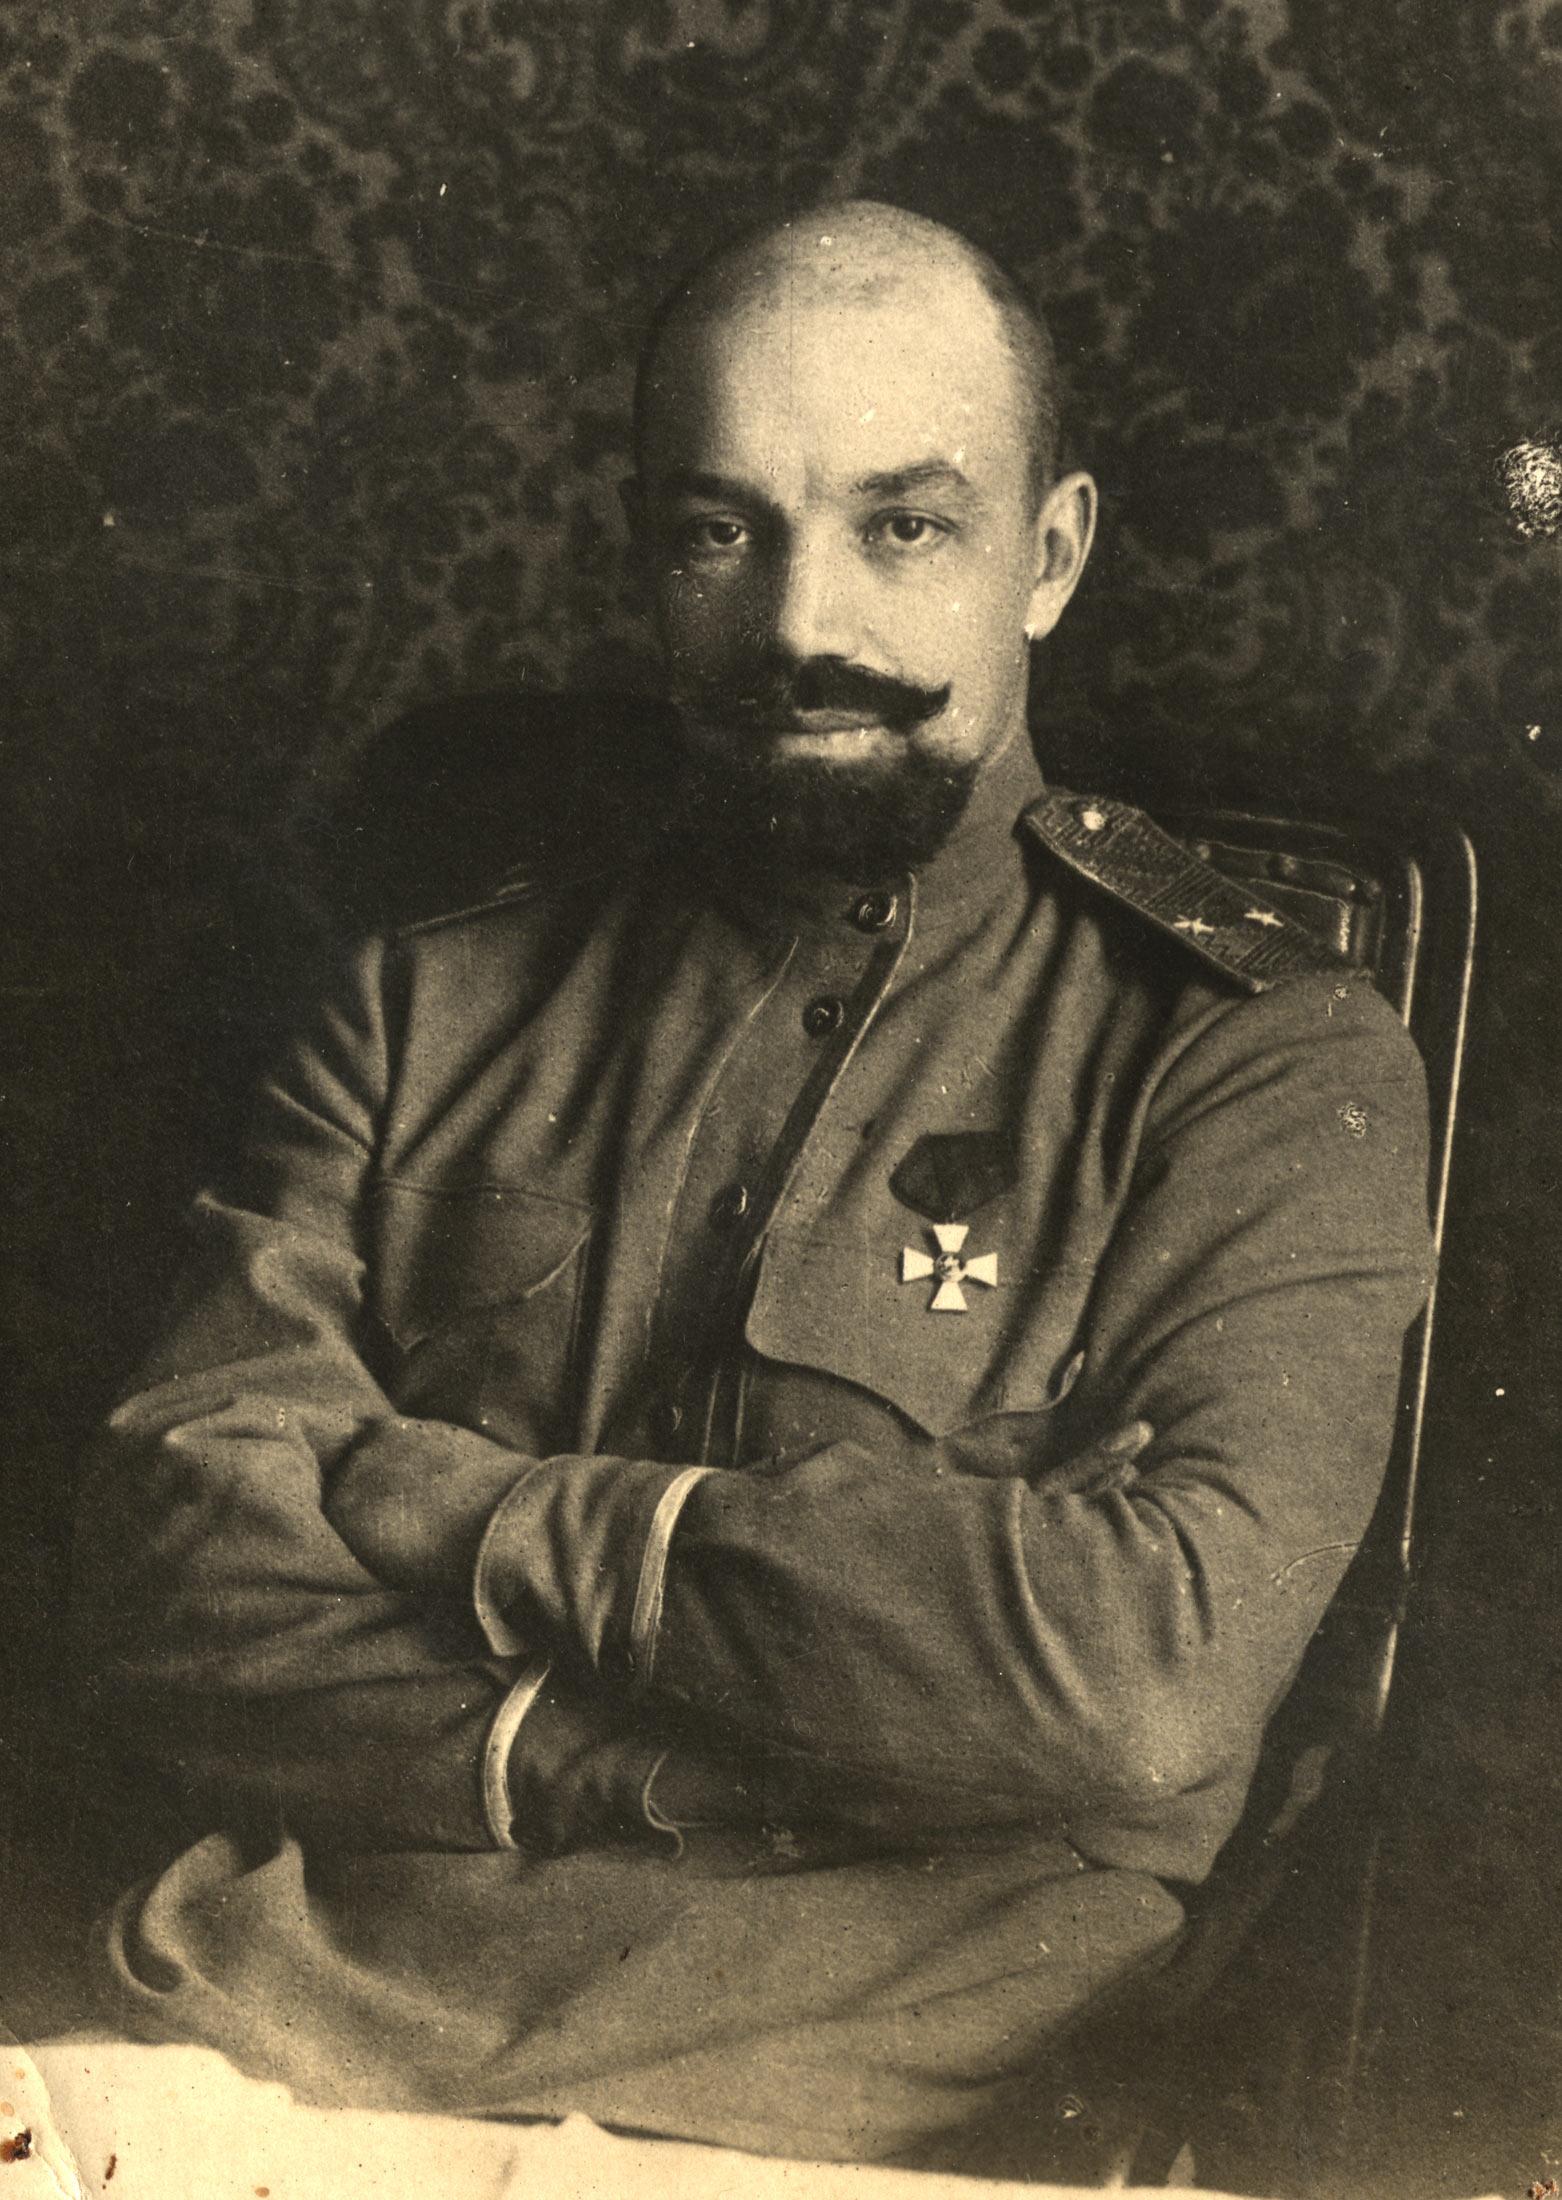 генерал от инфантерии Кутепов Александр Павлович